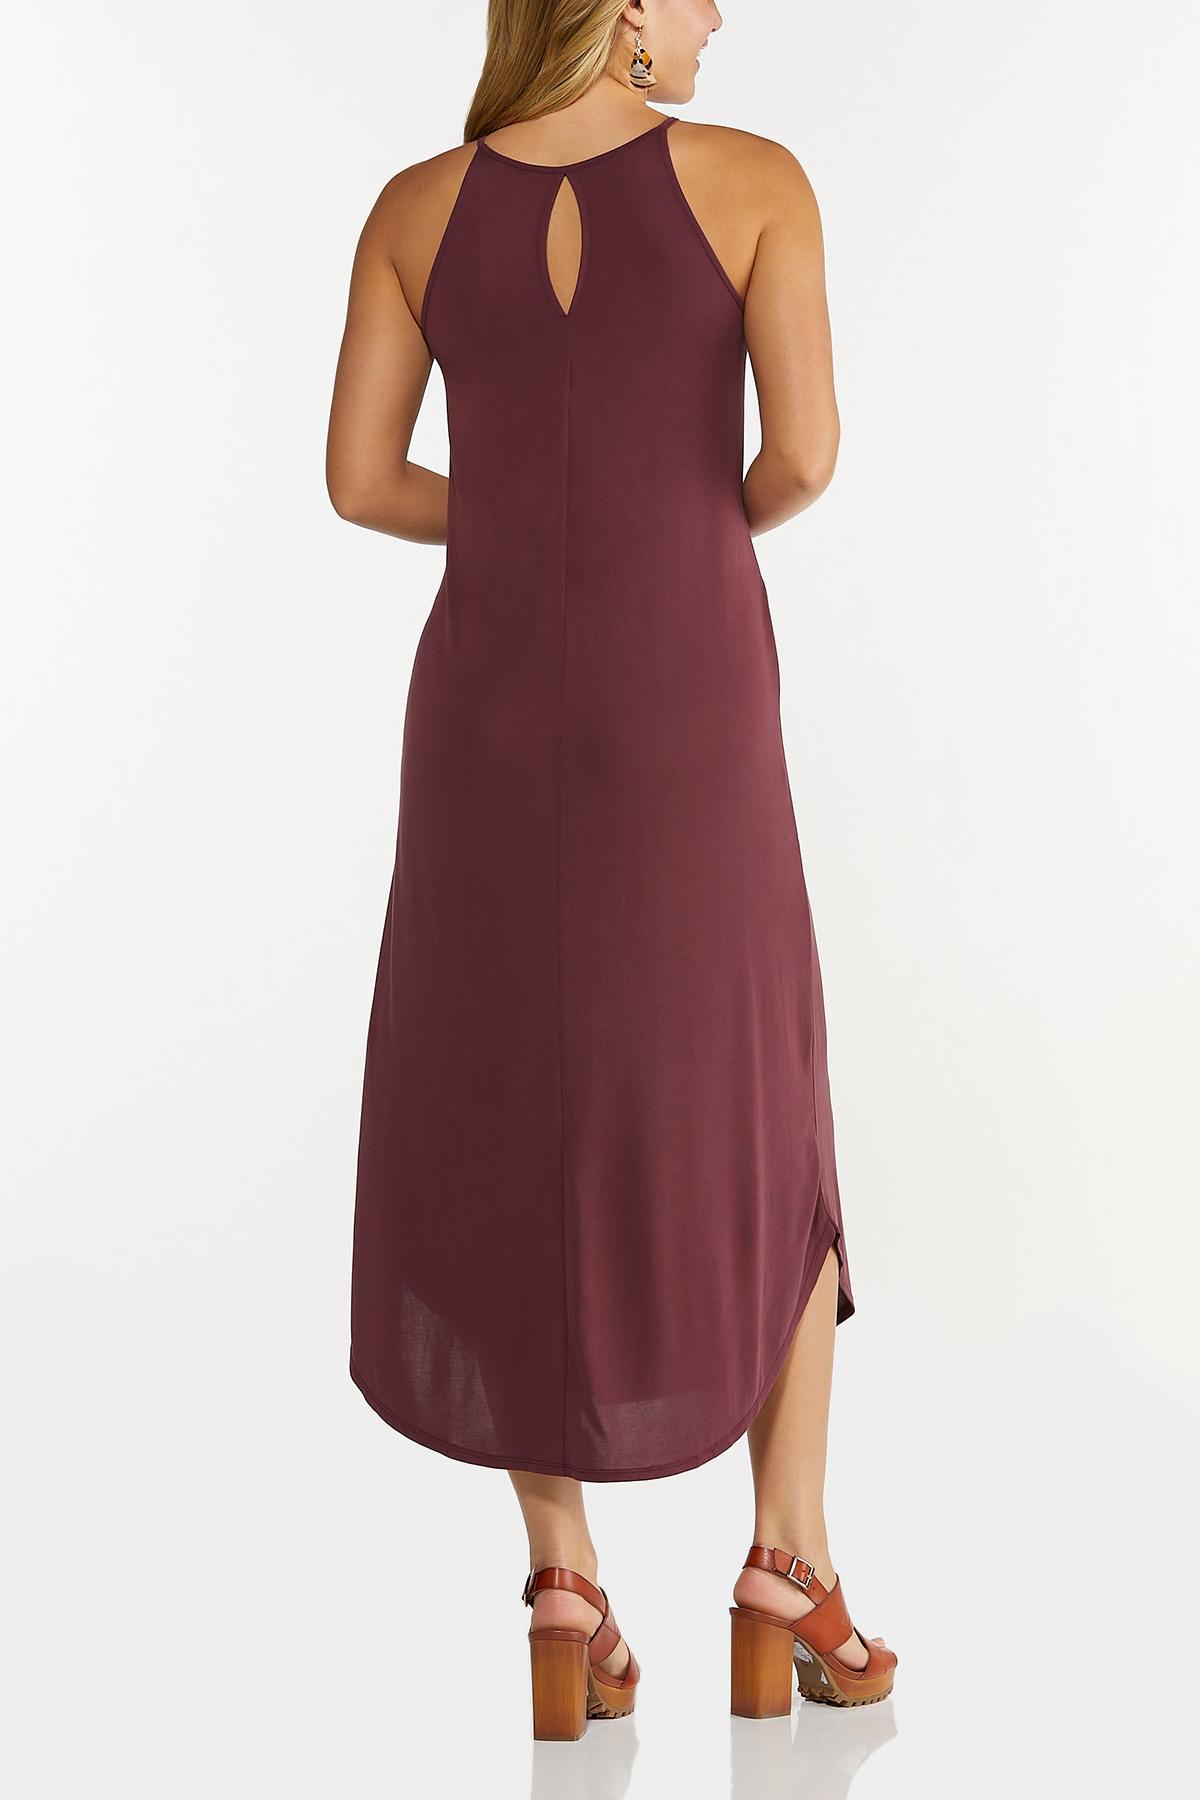 Plus Petite Curved Hem Midi Dress (Item #44633466)